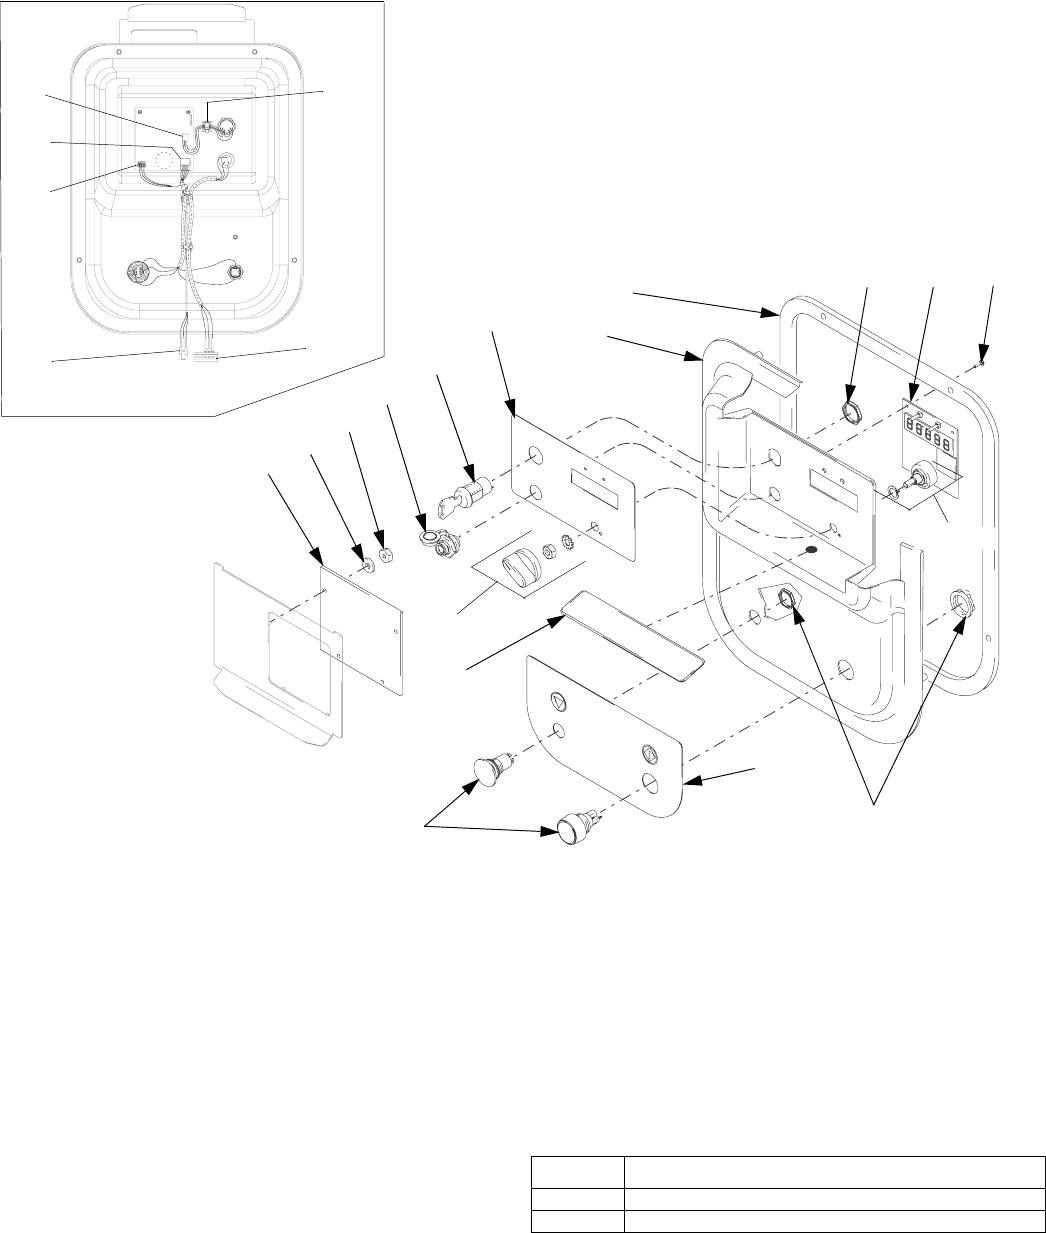 Graco 309518P Xtreme Mix, Repair, English User Manual To